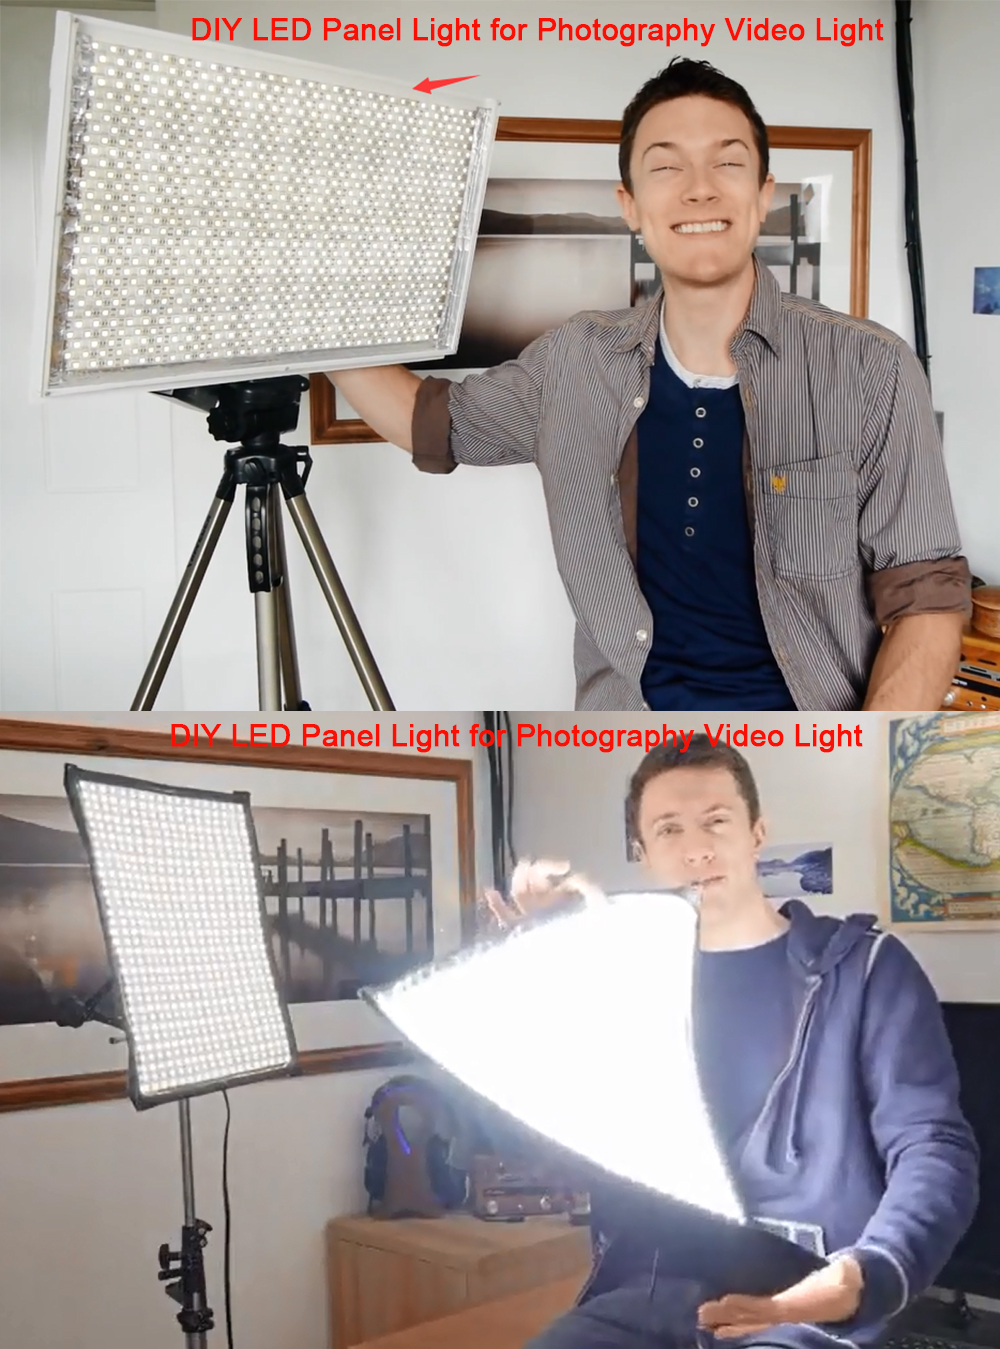 DIY LED U-HOME High CRI RA 90+/95+/97+ LED Strip Light SMD5630 Daylight White 5600K For Camera Photography DIY LED Panel Light